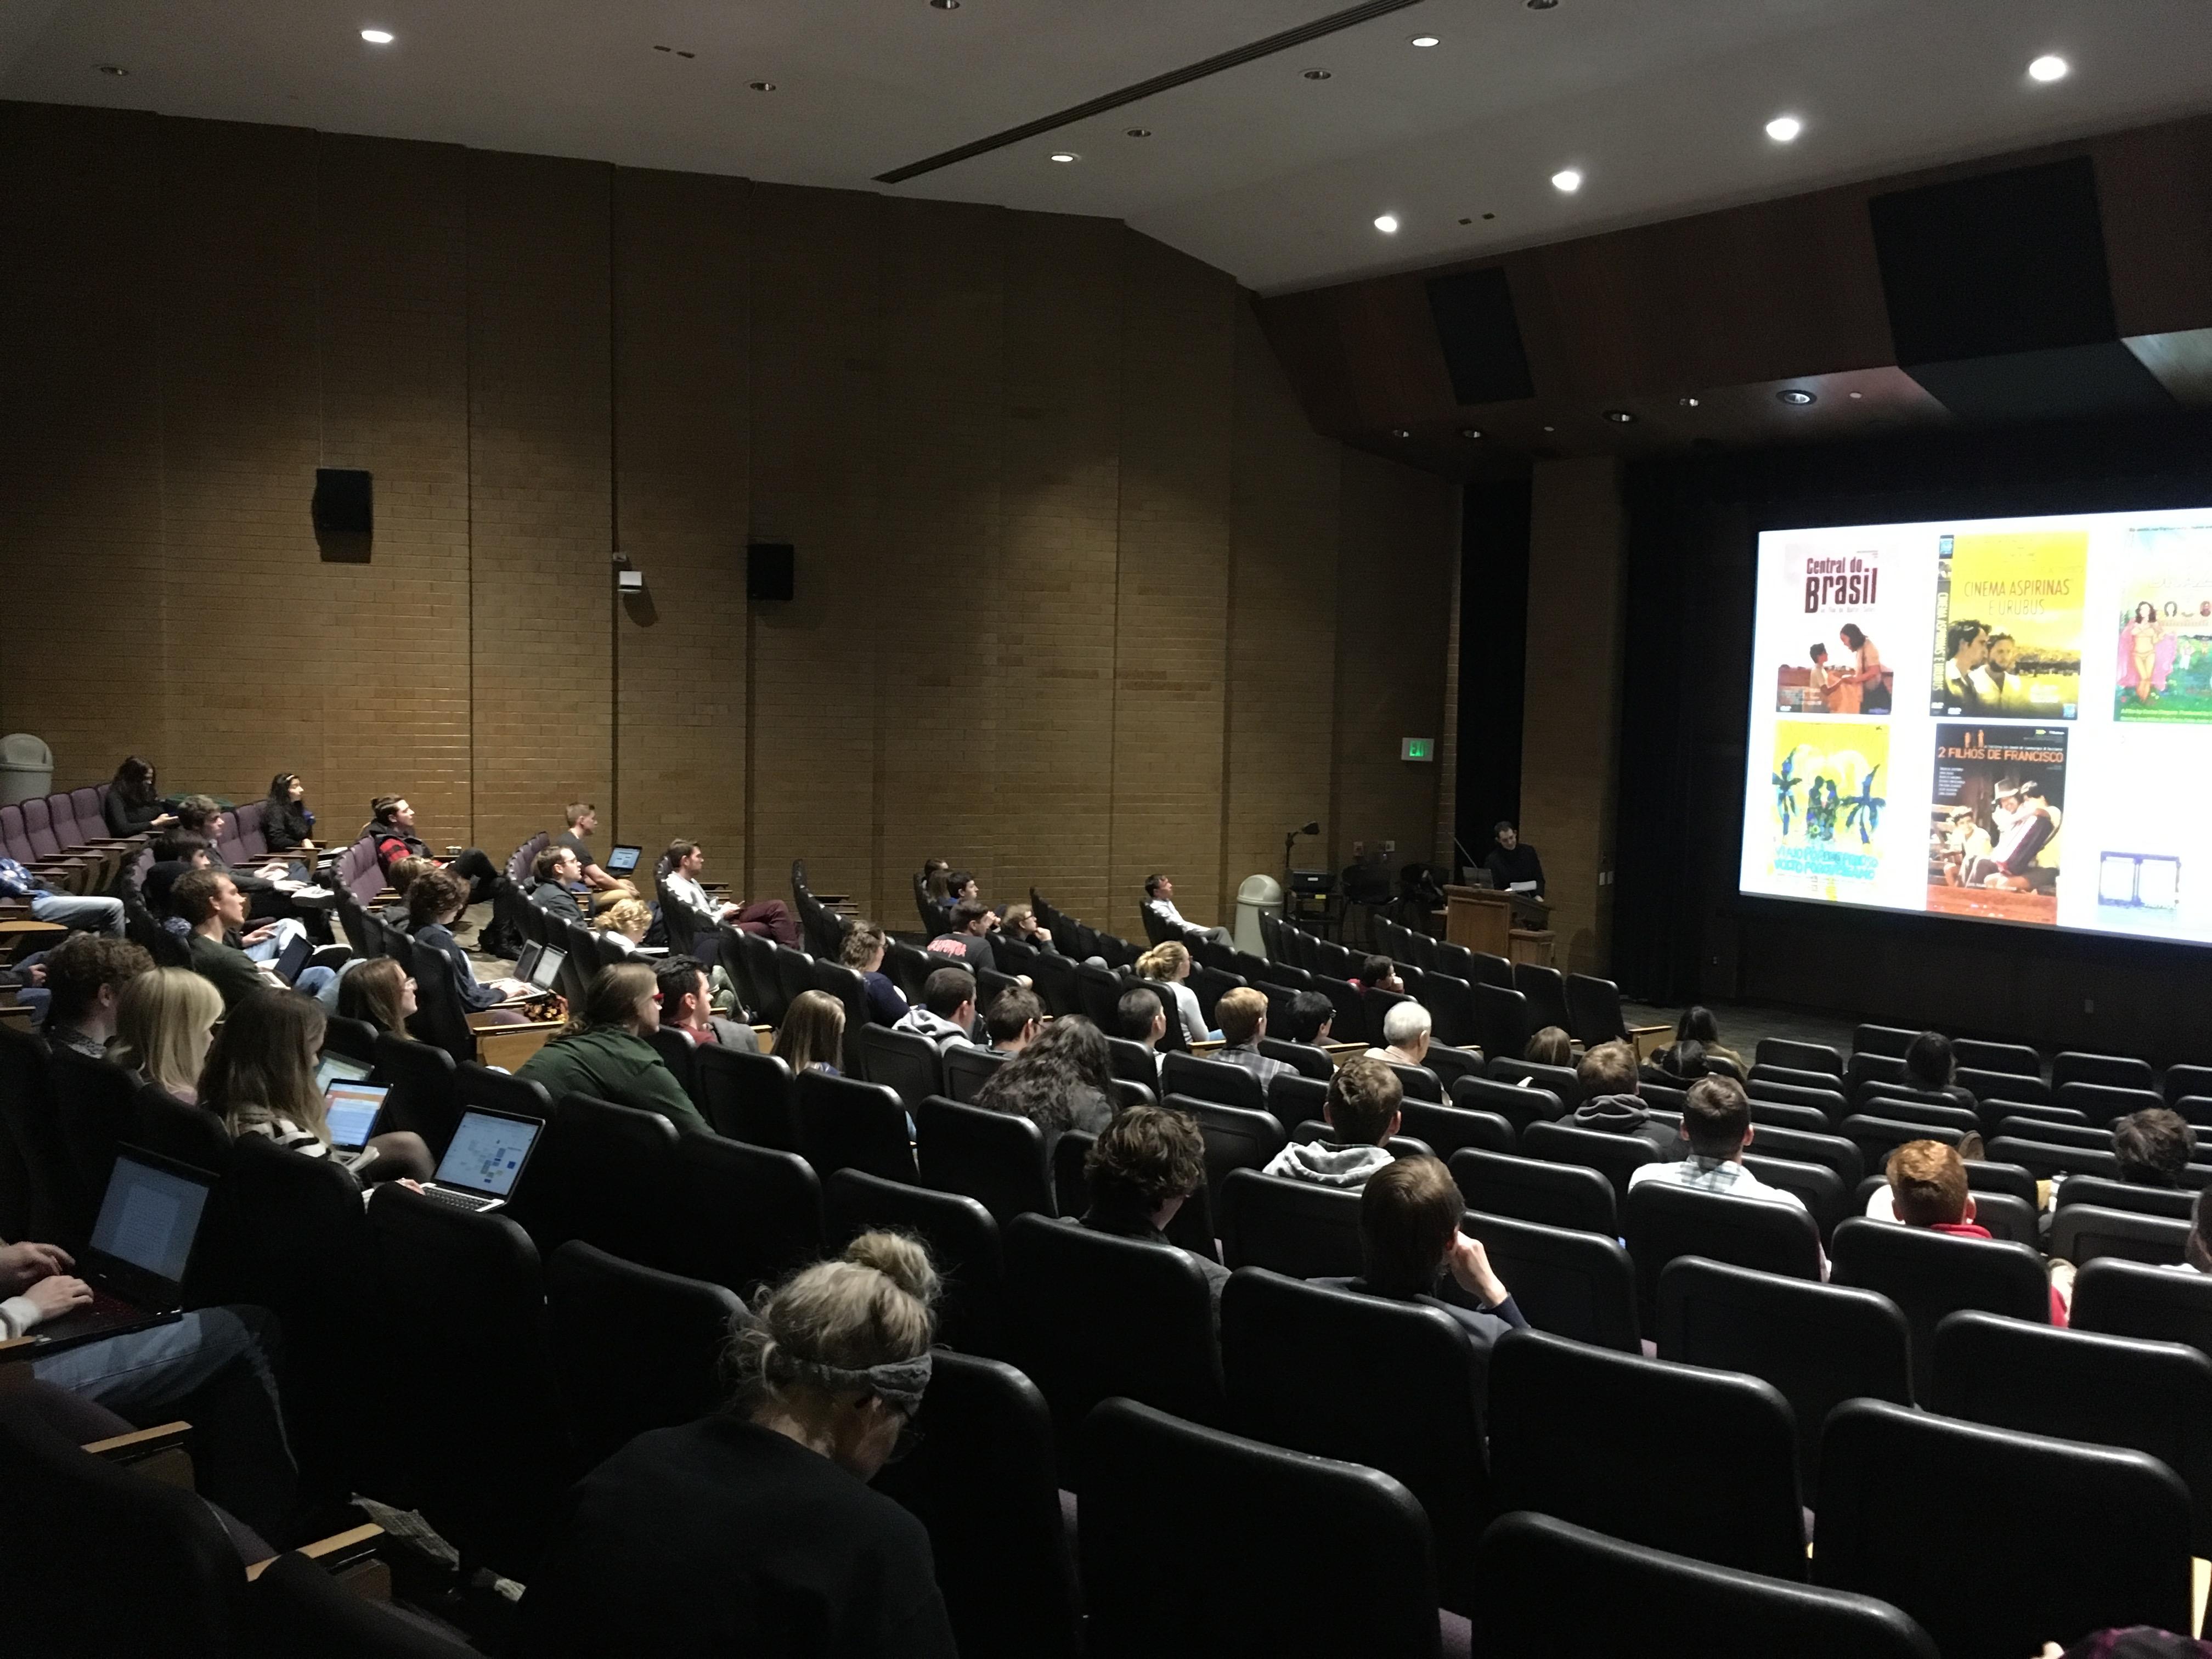 Rex Nielson: Brazilian Migrants in the Cinema